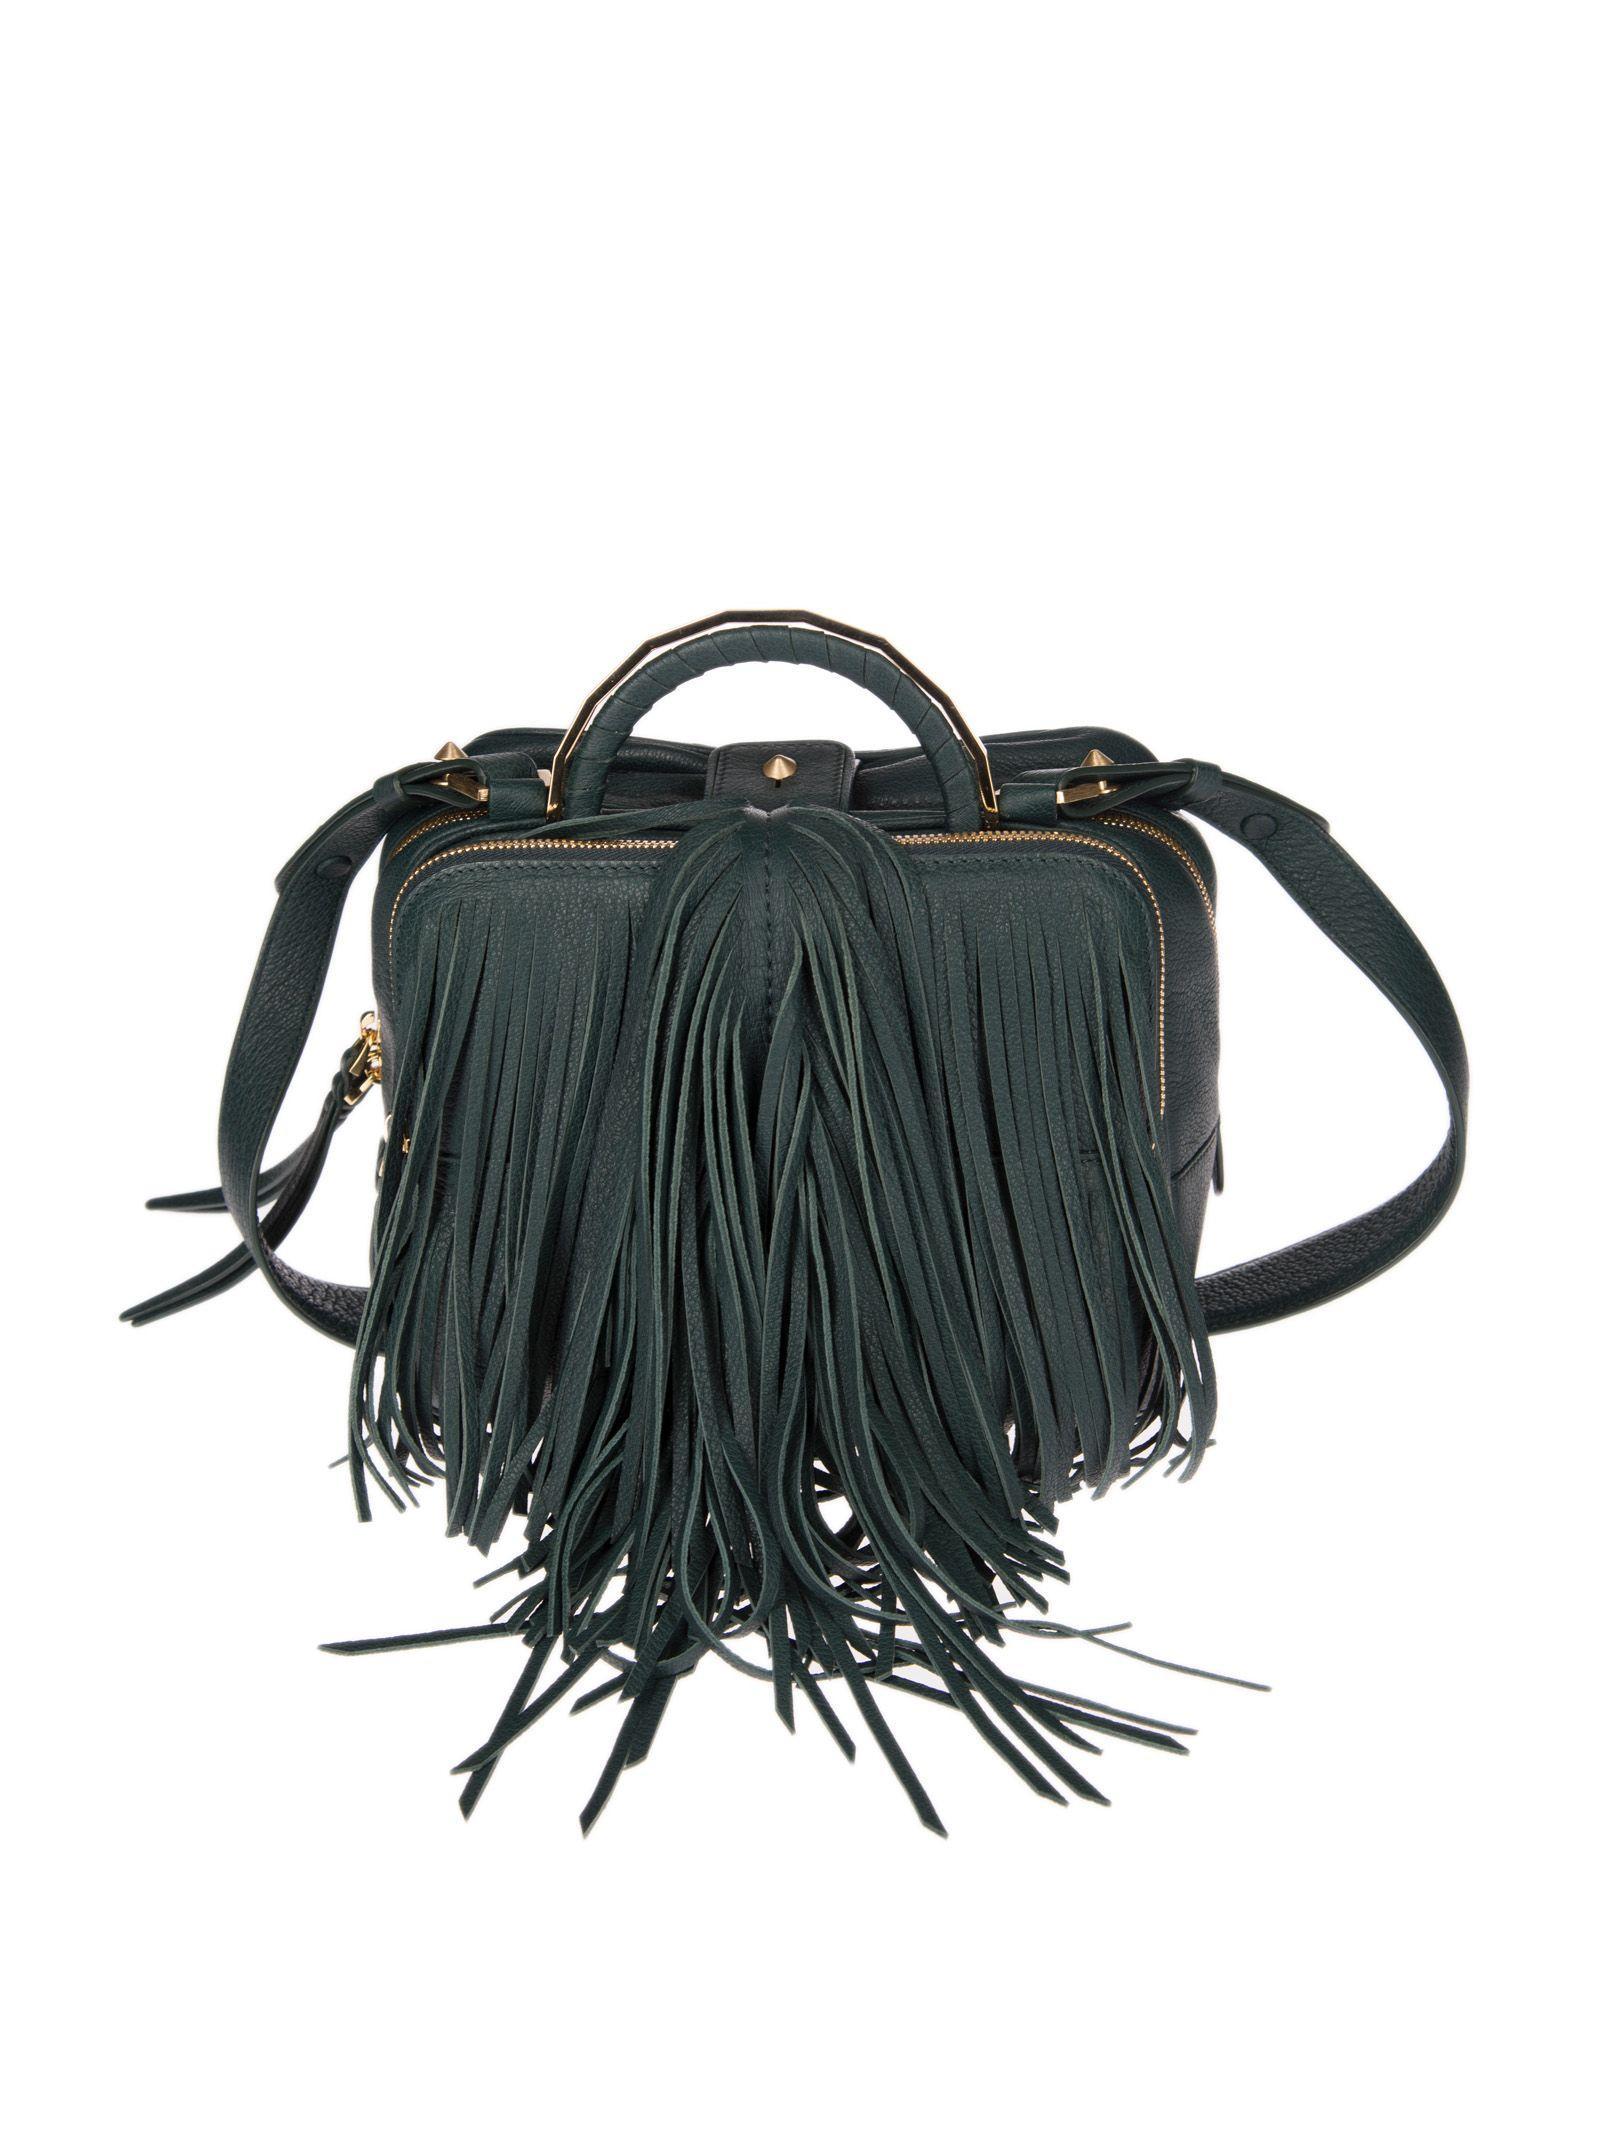 The Volon Shu Shu Small Bag